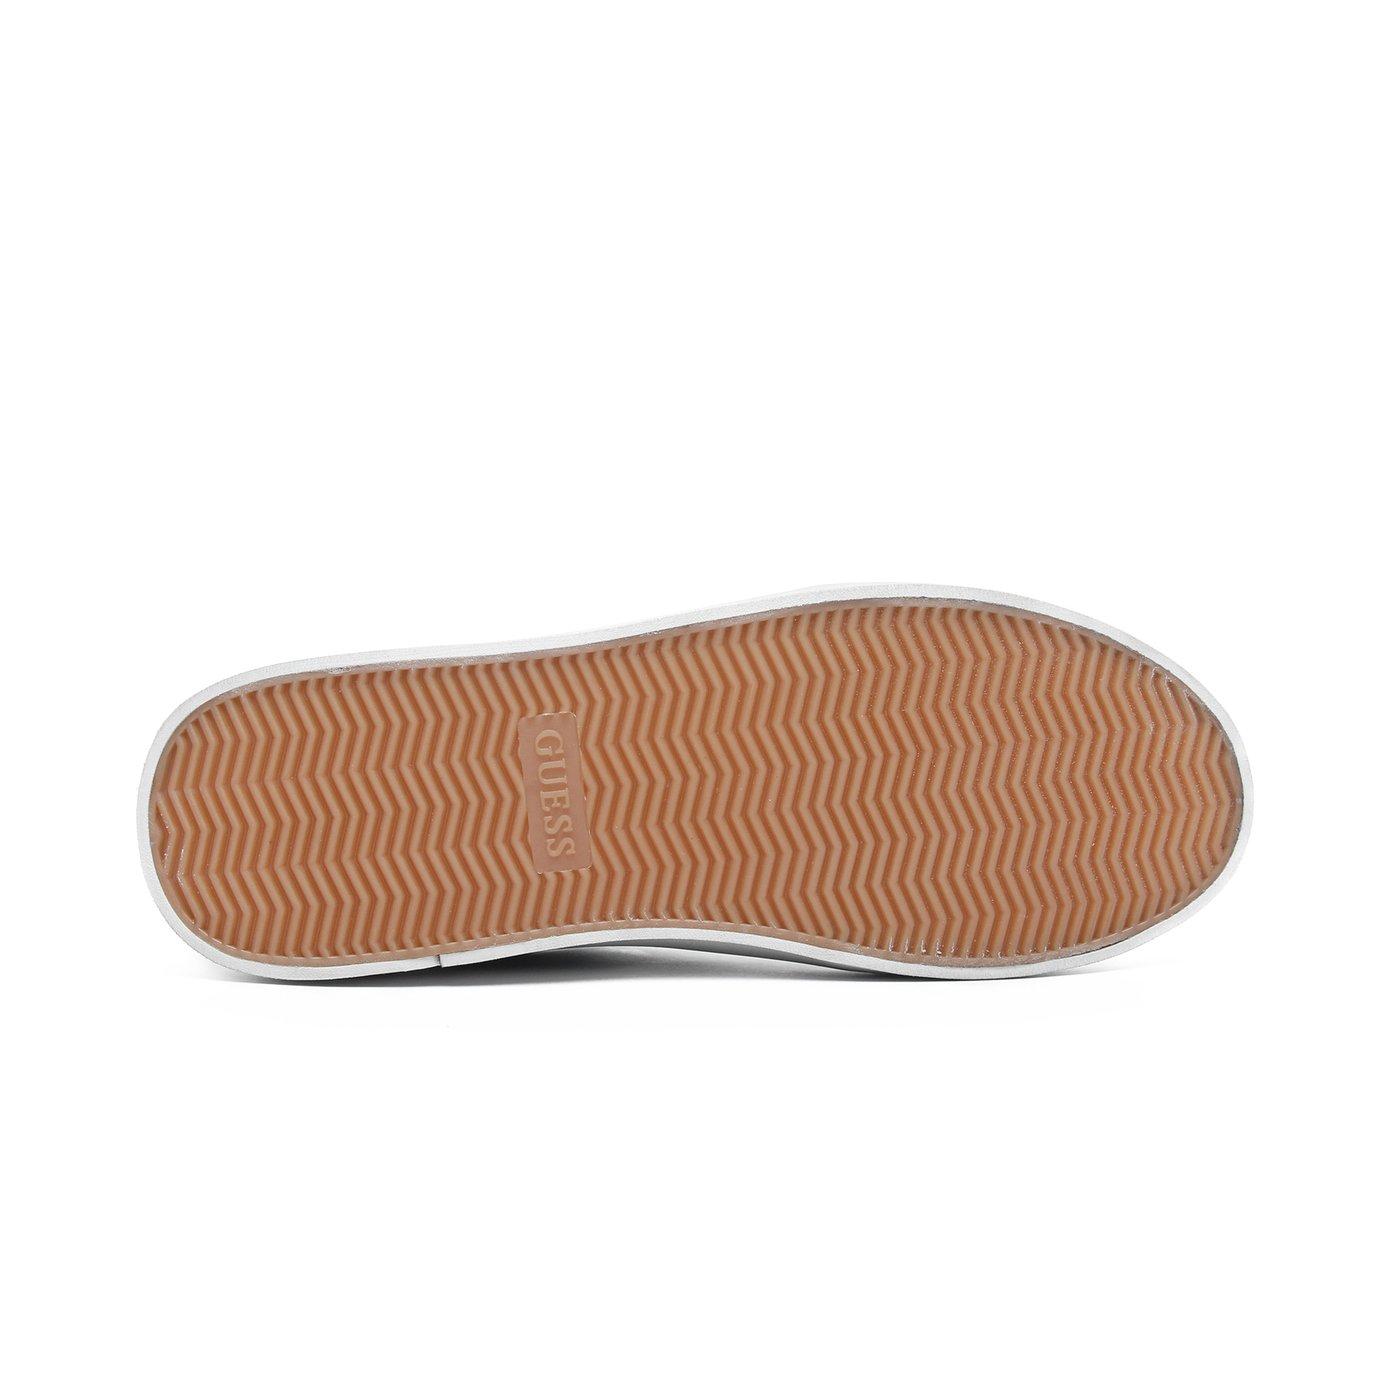 Guess Firenze Erkek Siyah Günlük Ayakkabı